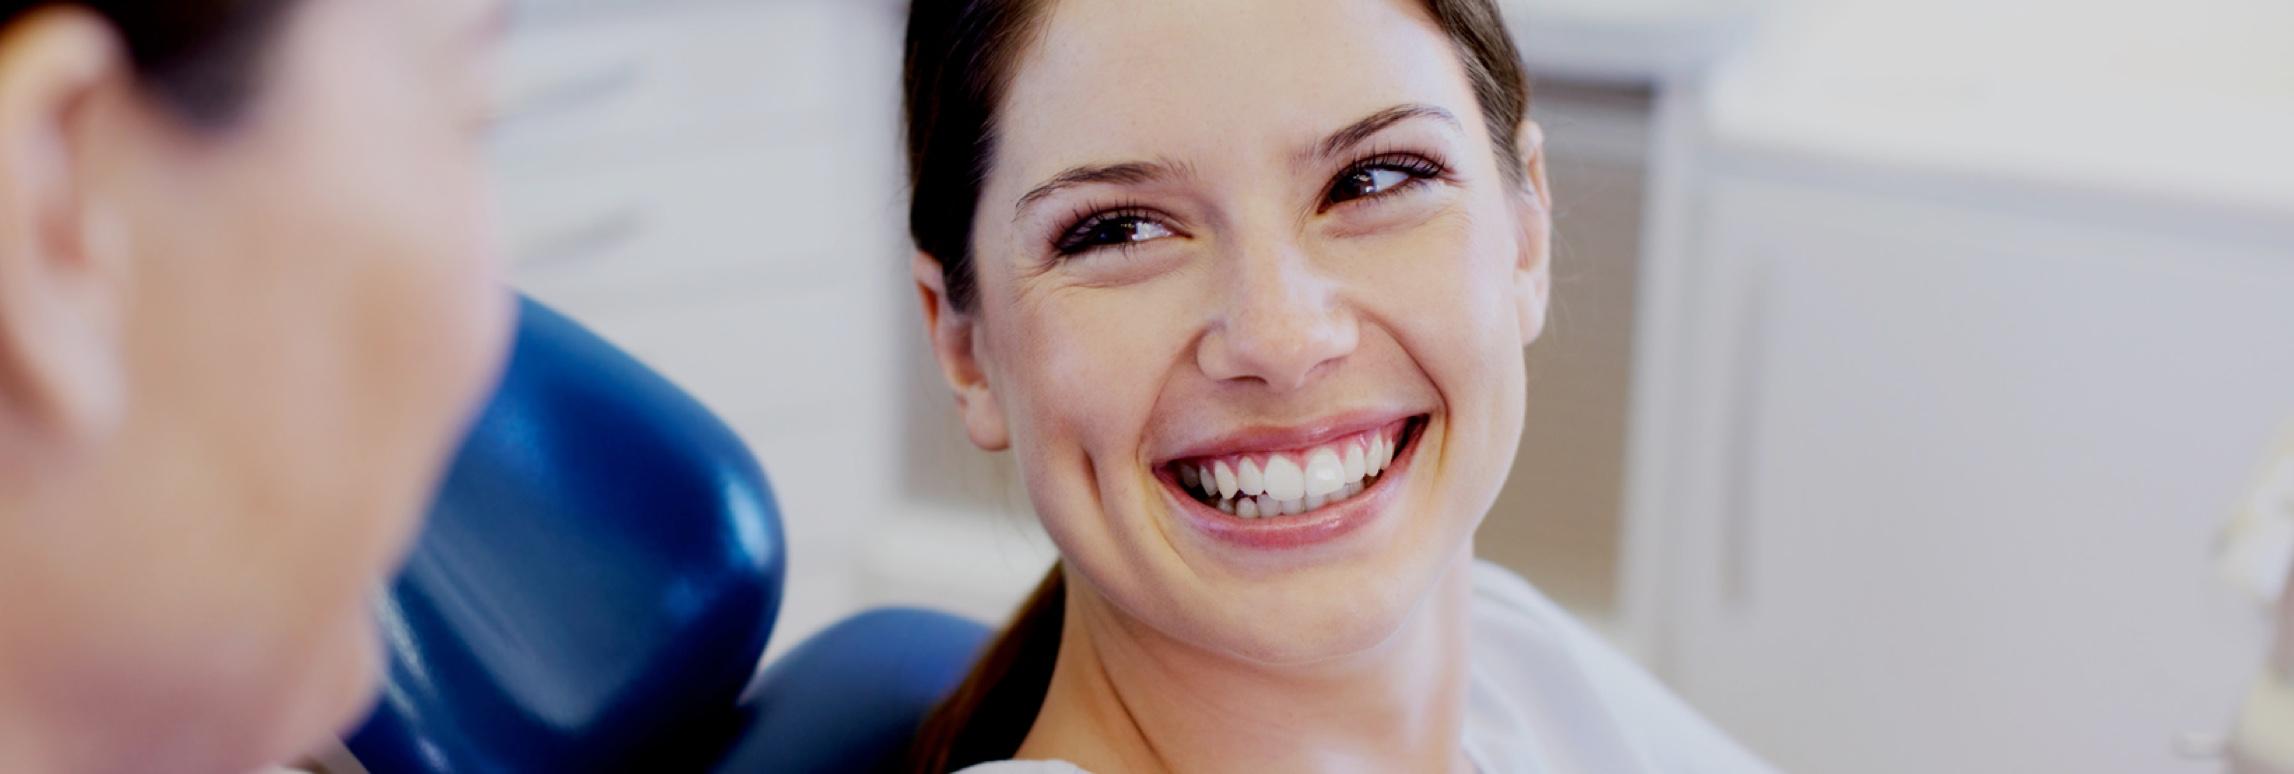 clinica dental aiguafreda